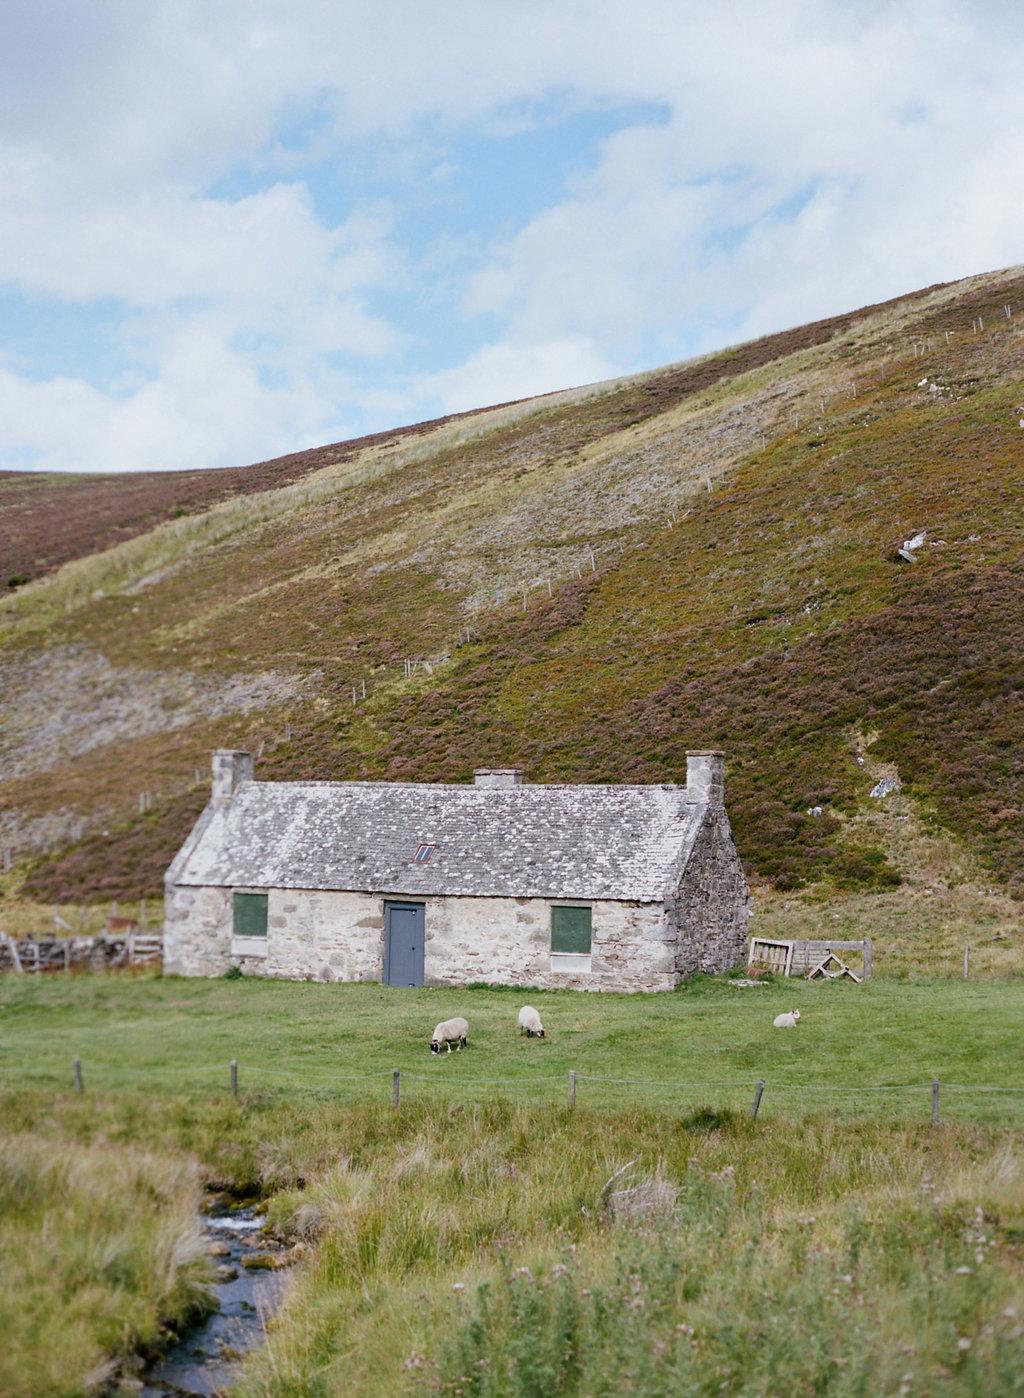 Scotland-Prewedding-highlands-castle-Engagment-Photos-Katie-Grant (71 of 139).jpg